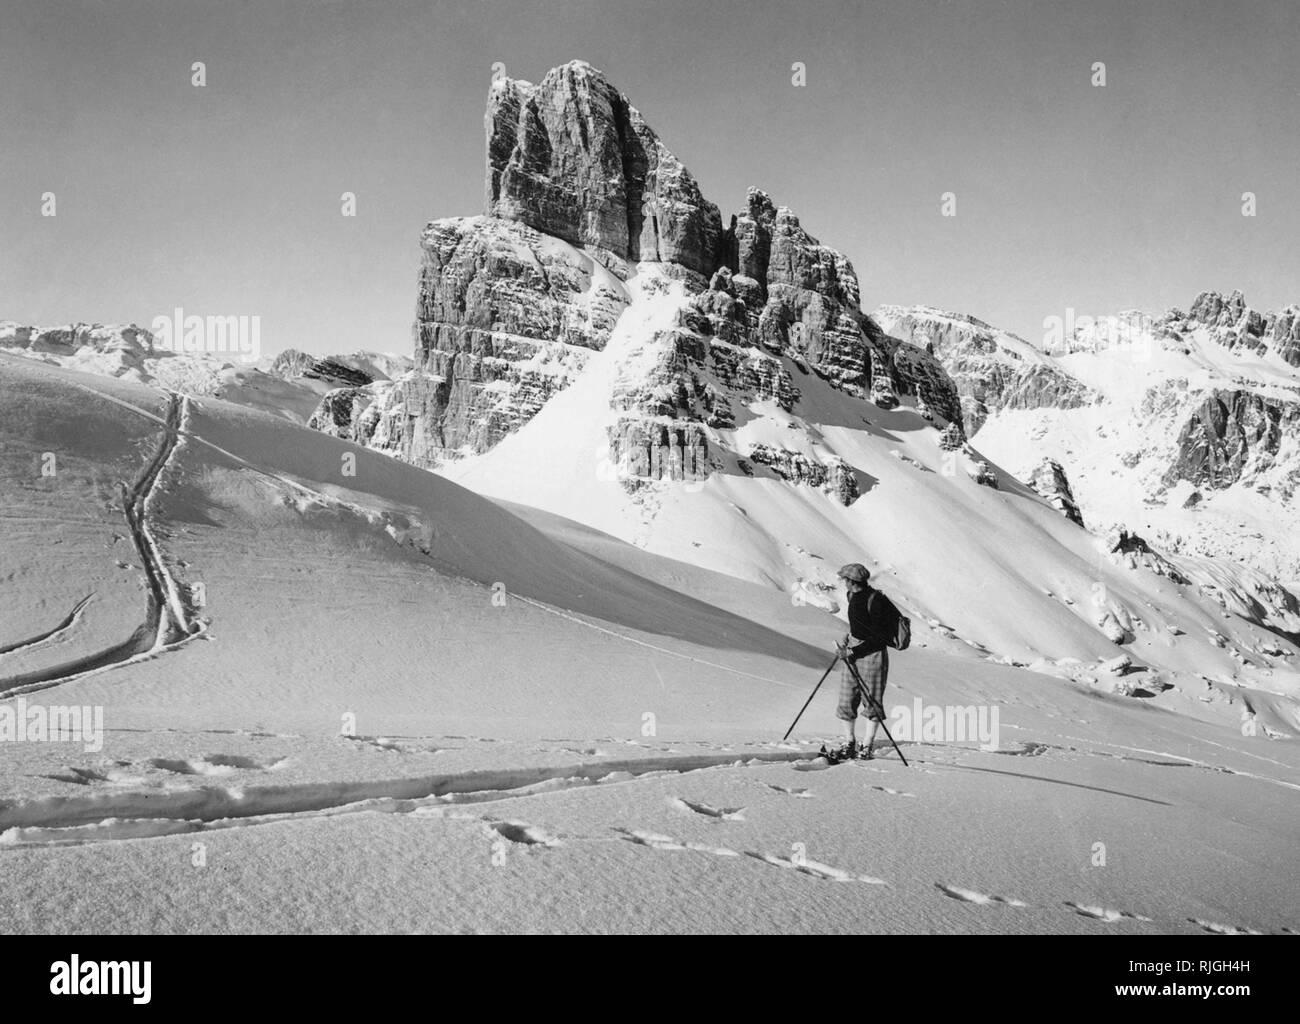 italy, dolomites, ski, 1940-1950 - Stock Image